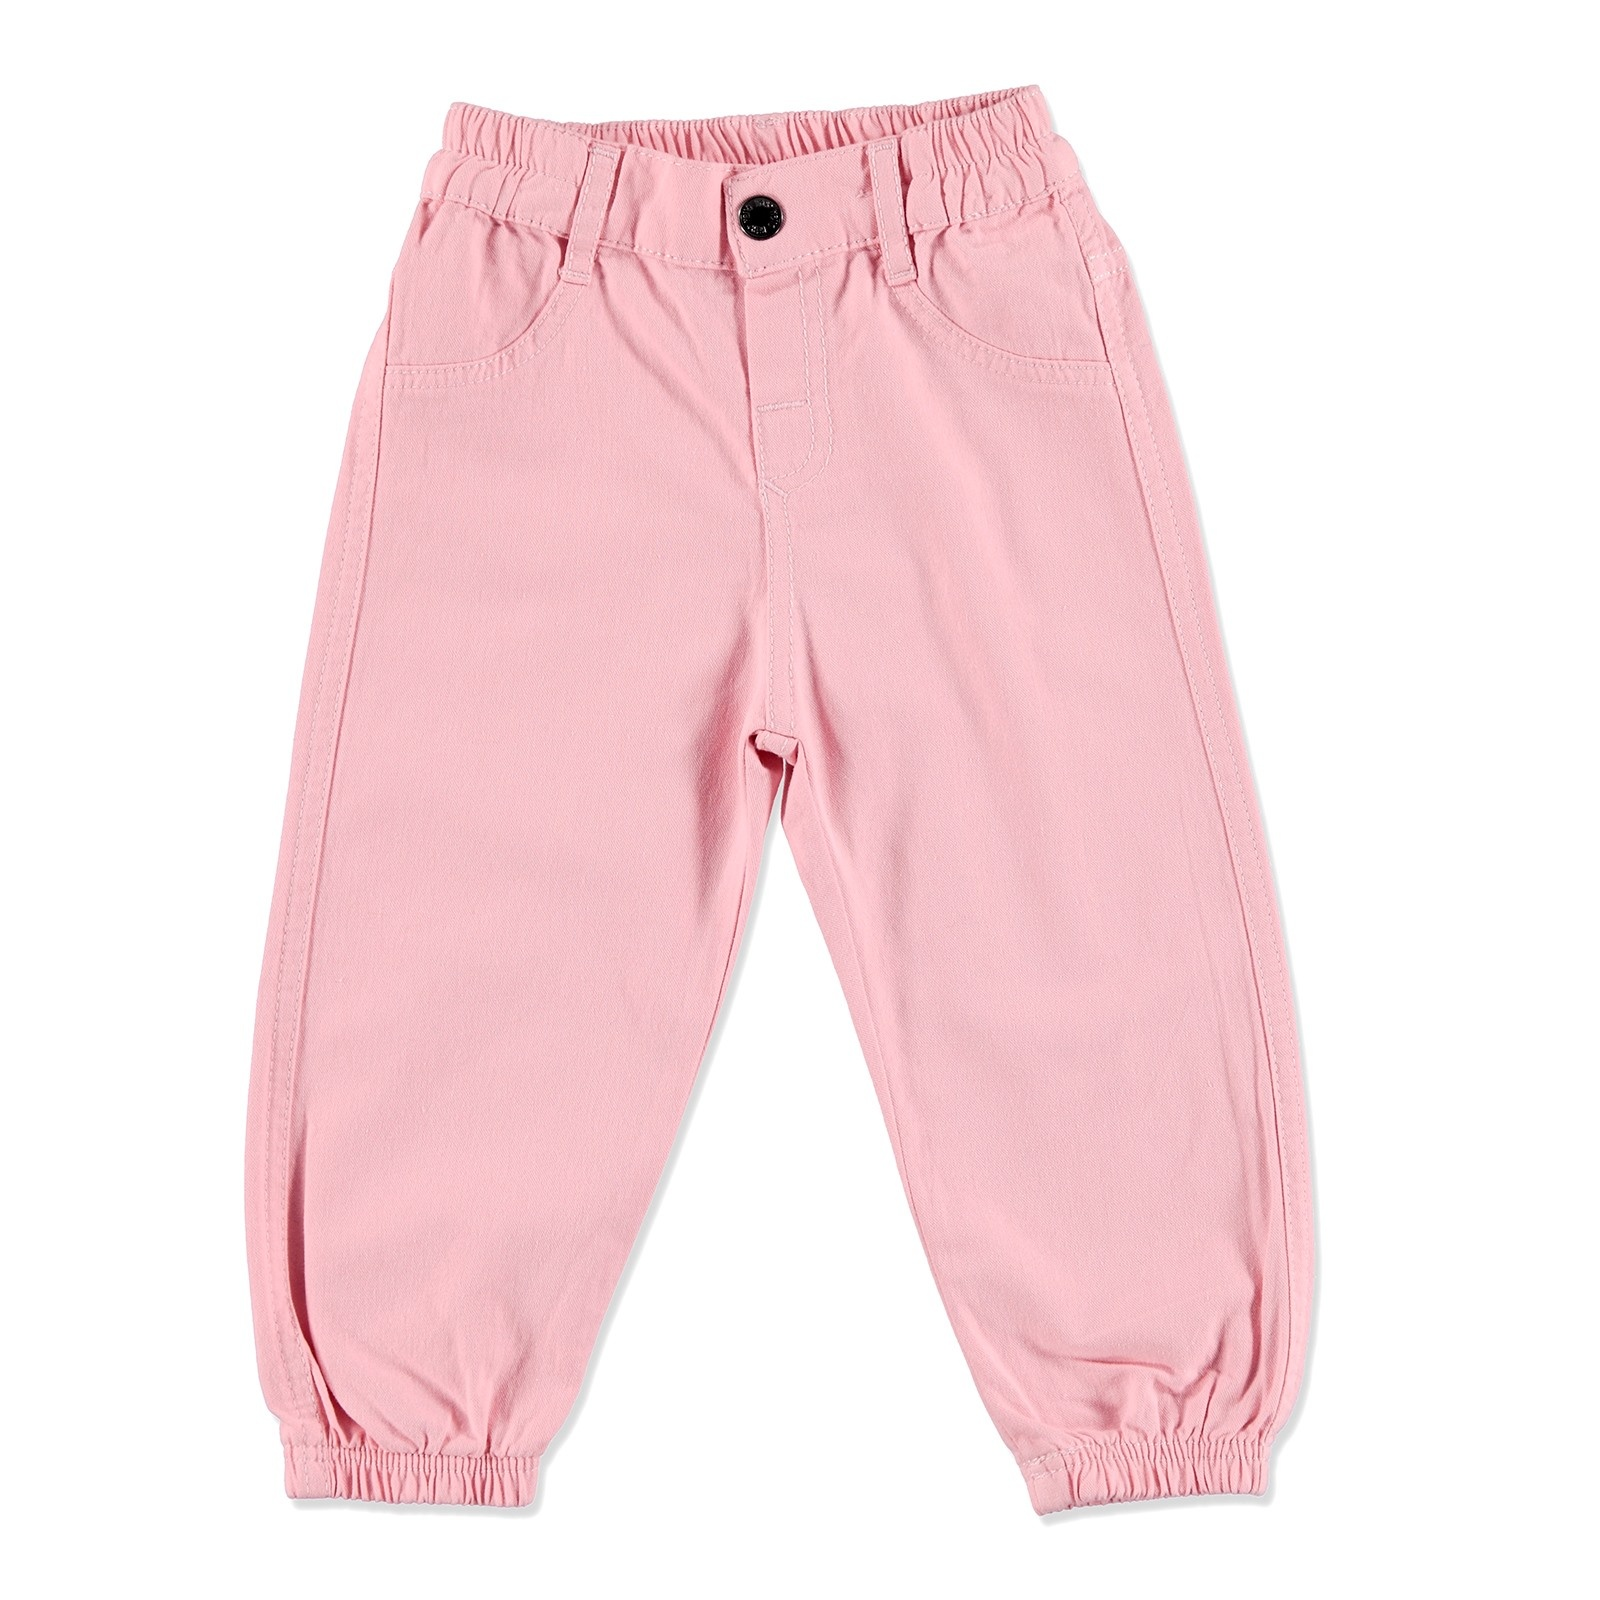 Ebebek HelloBaby Summer Baby Girl Cotton Pant